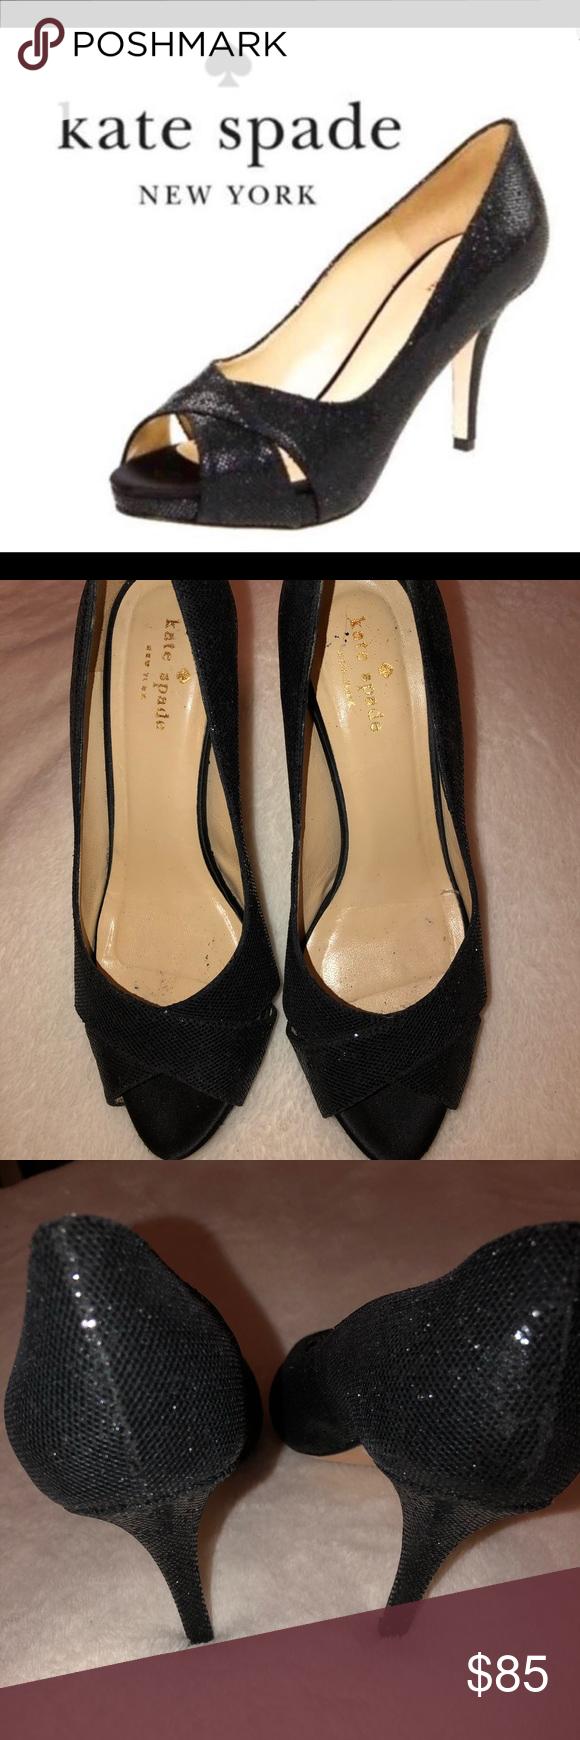 c365c198d17c Kate Spade Billie Glitter Lame Peep Toe Pumps Kate Spade Black Billie  Glitter Lame pumps size